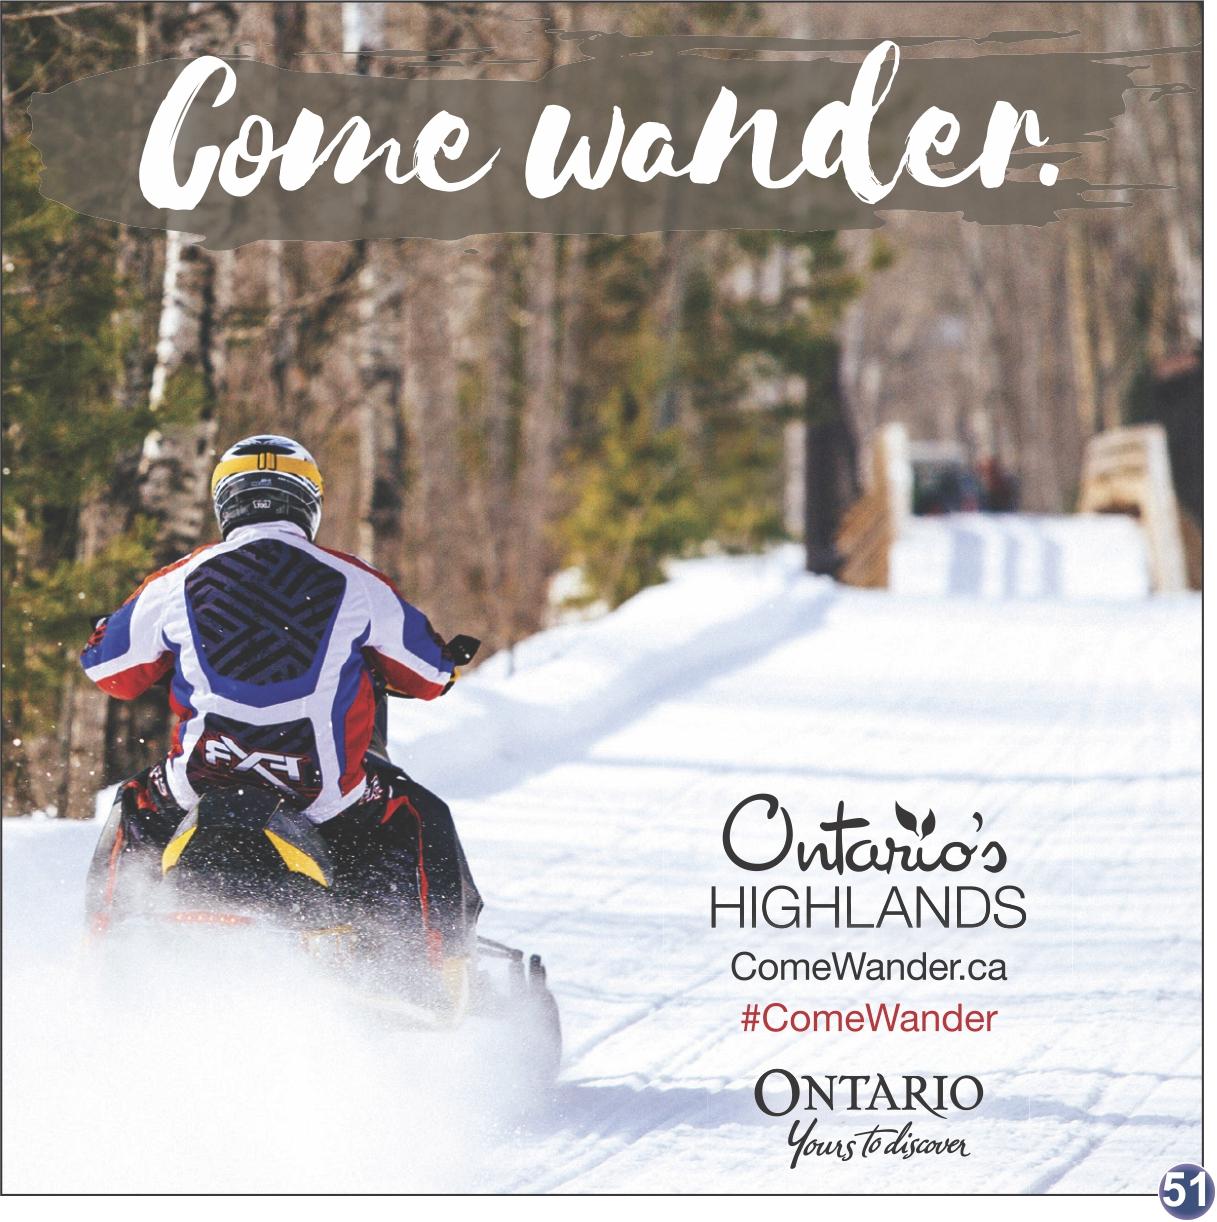 Ontario Highlands